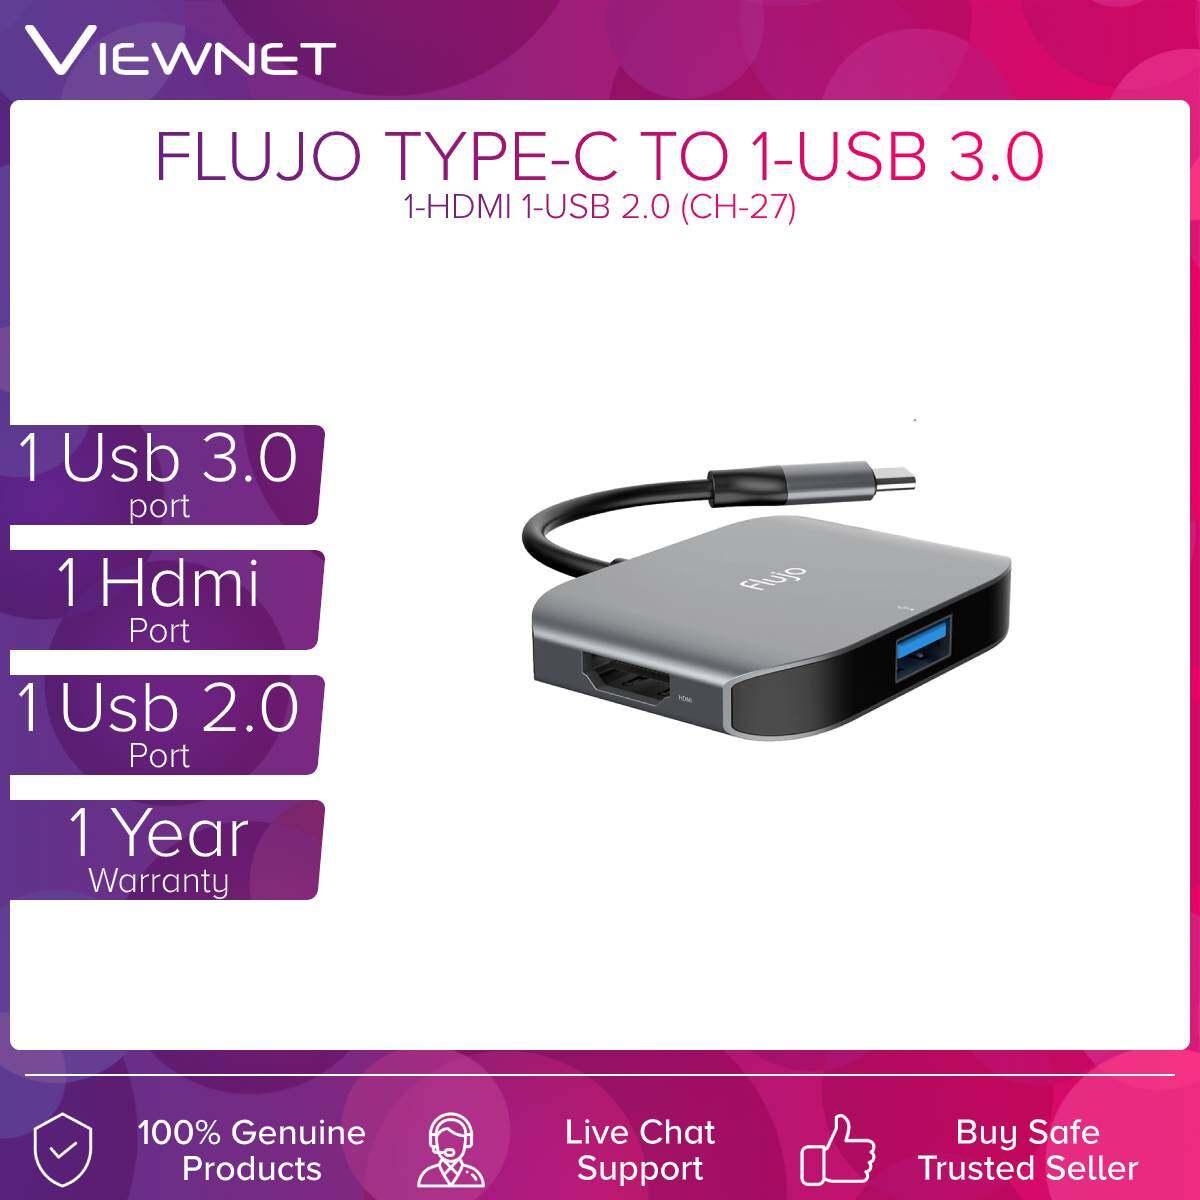 Flujo (CH-27) Type-c To Hdmi + 1-Usb3.0 + 1-Usb2.0  Adapter